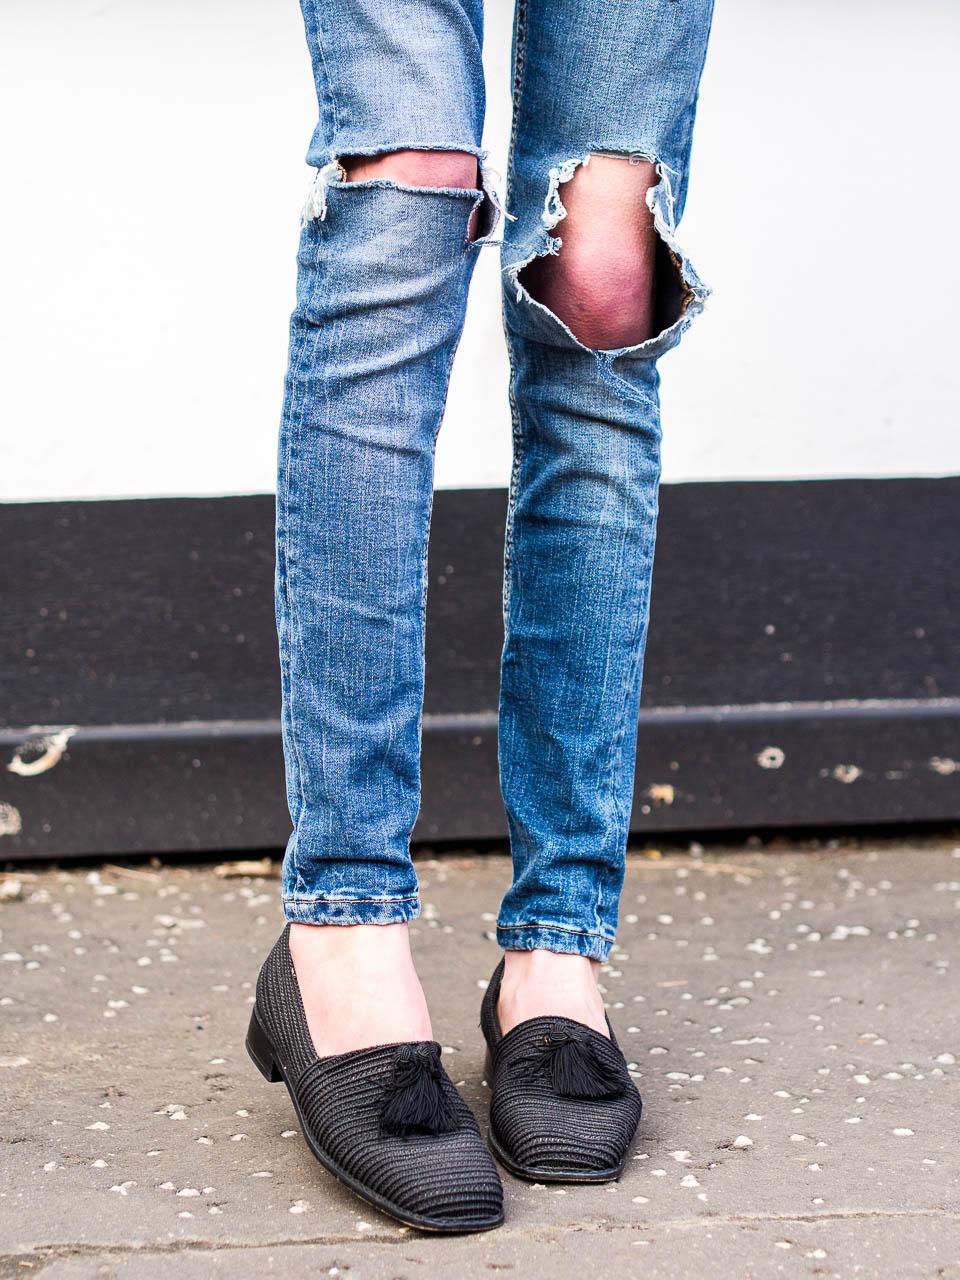 stuart-weitzman-tassel-shoes-vintage